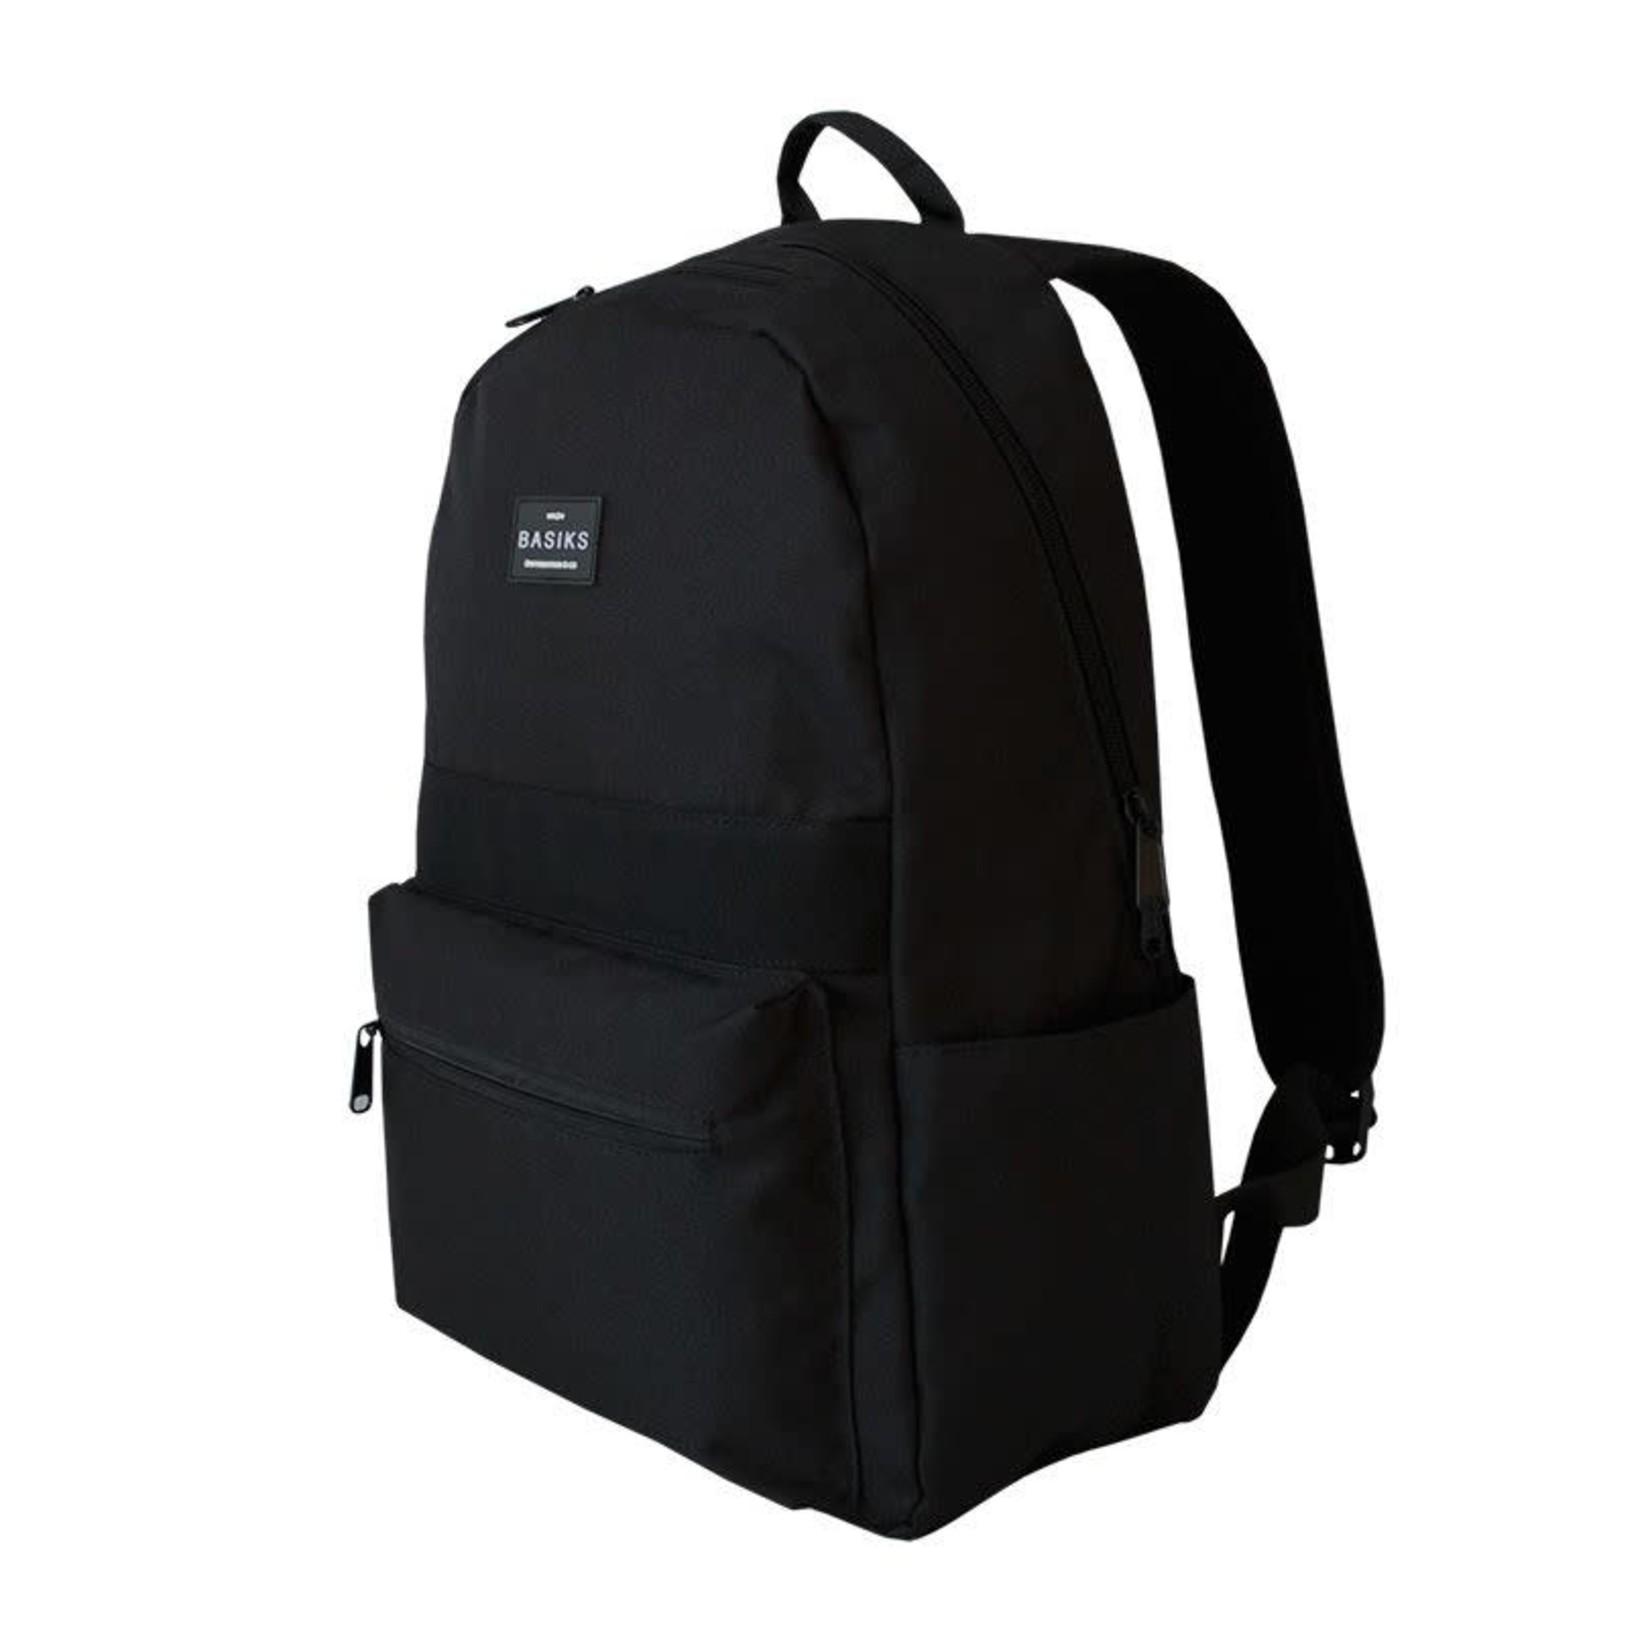 Basiks.Co Basiks.Co : Origin Backpack Black,O/S